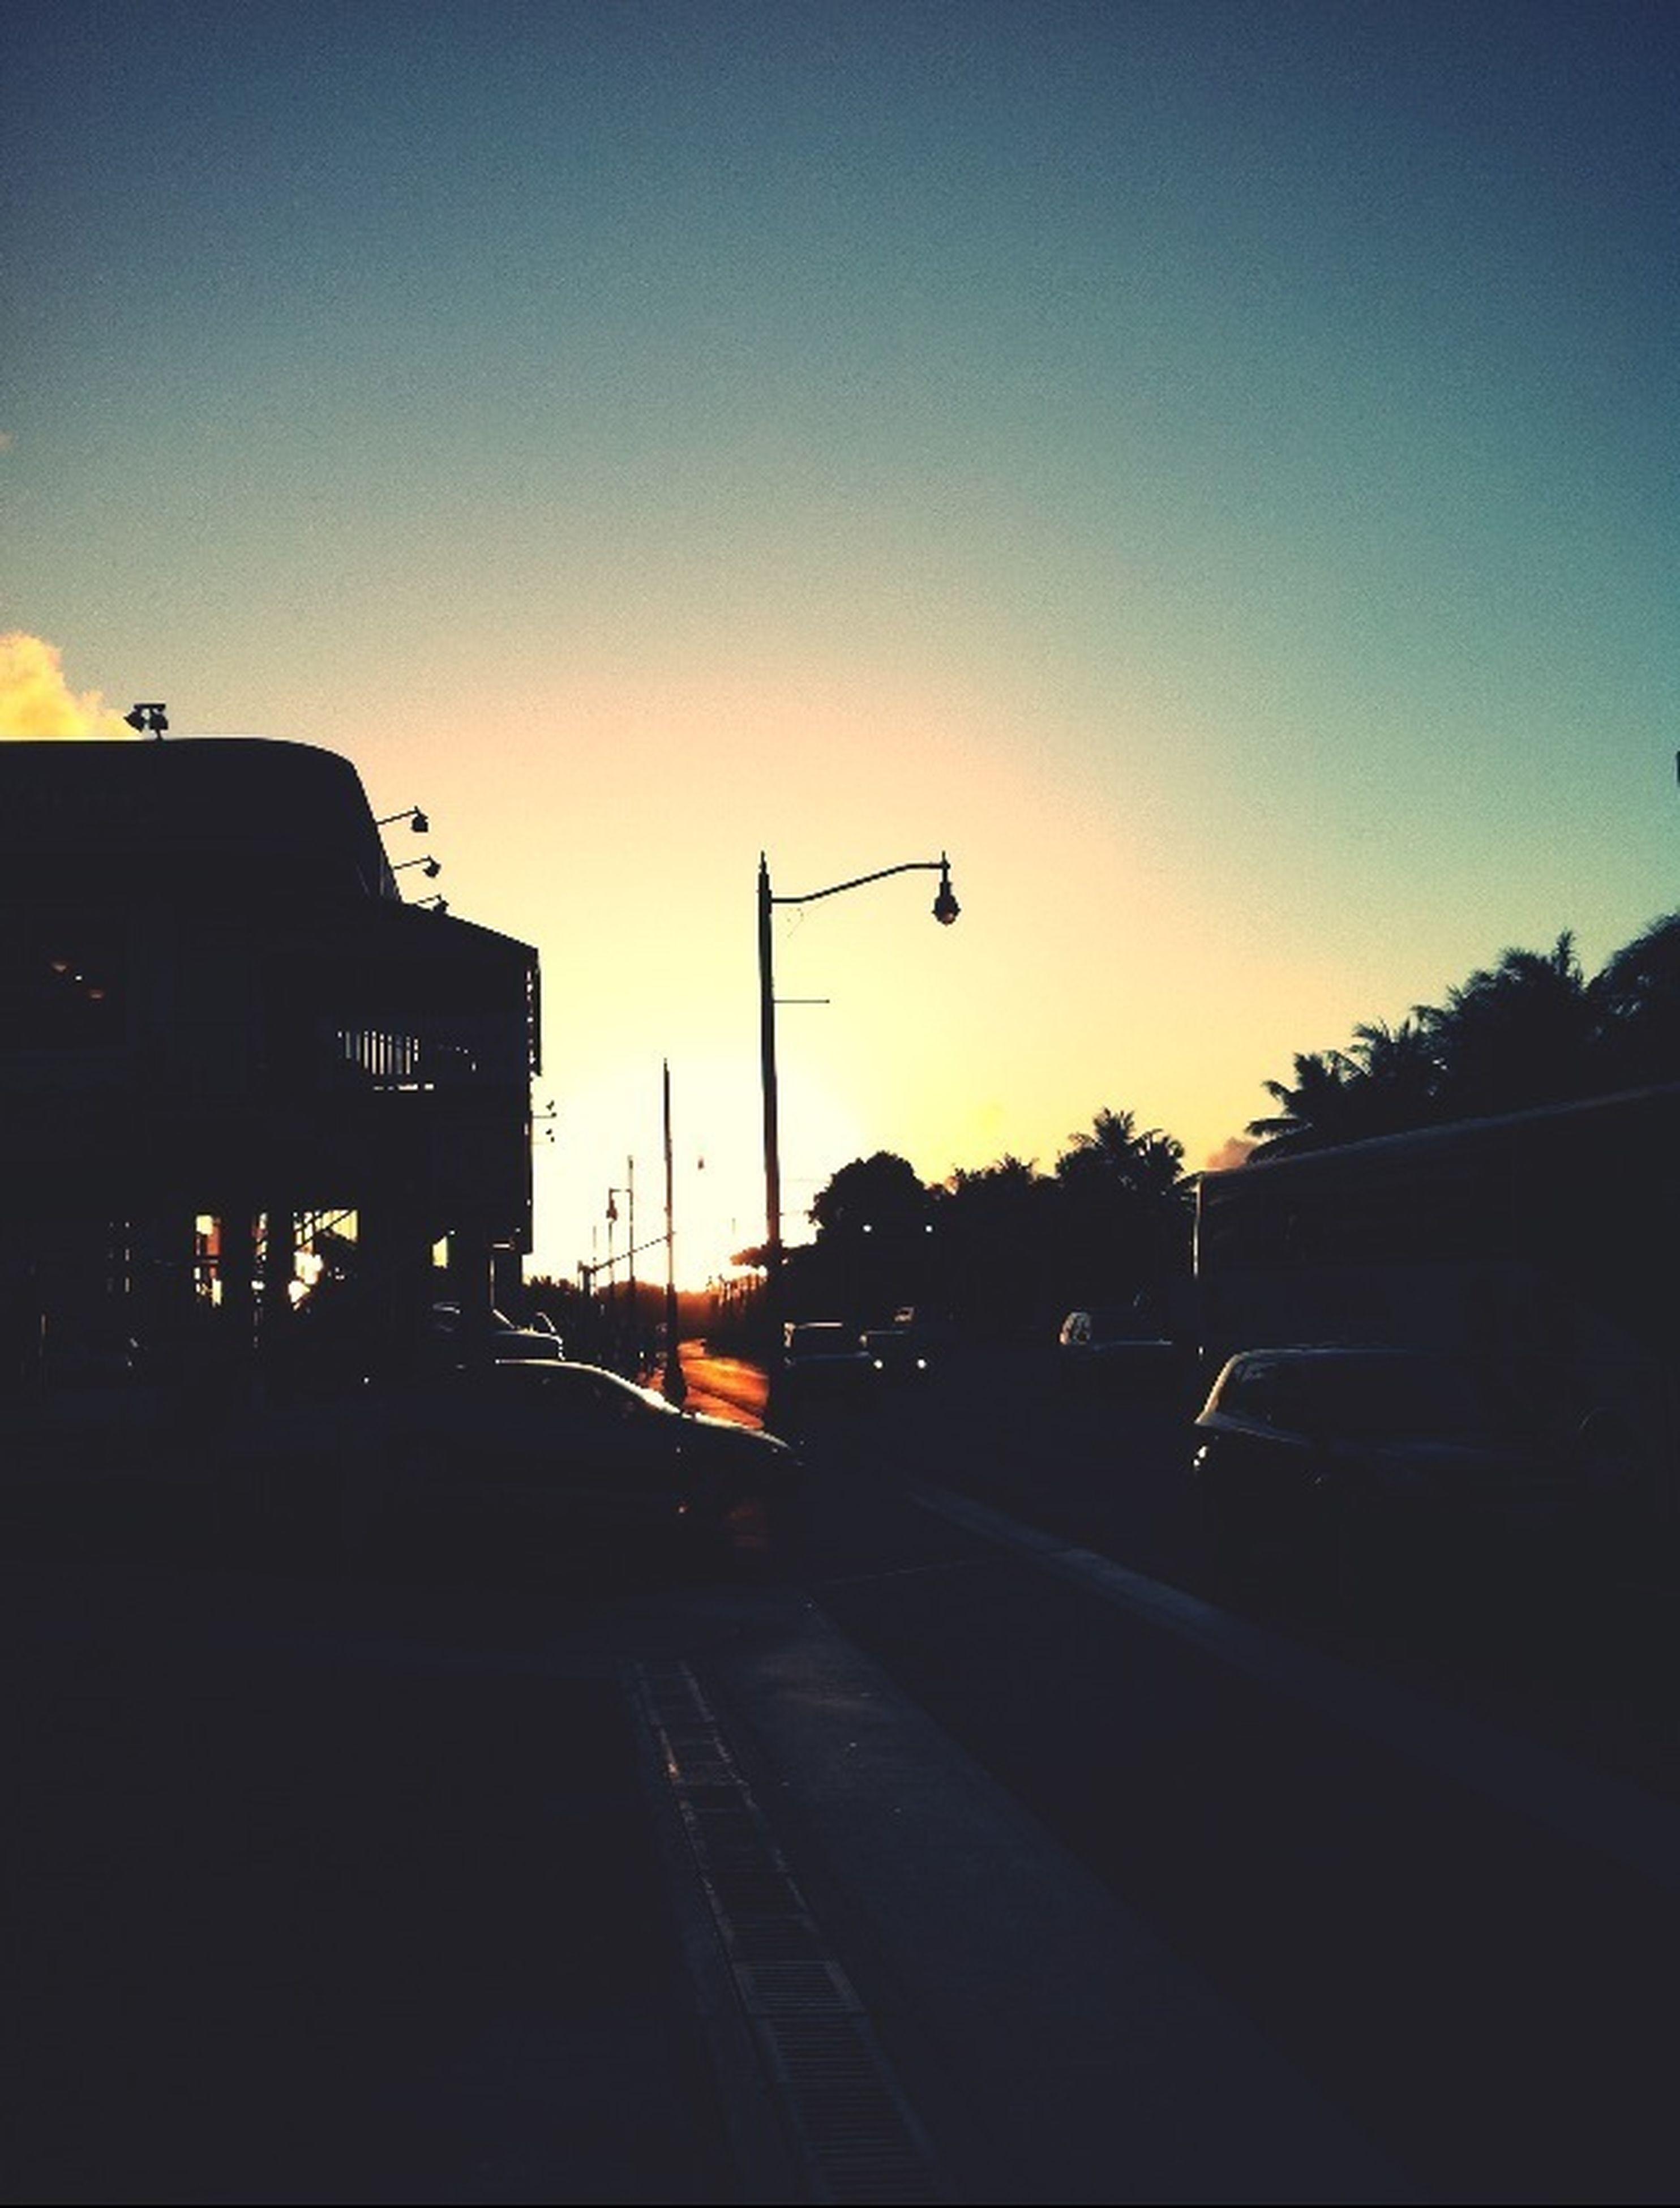 sunset, transportation, clear sky, street light, car, silhouette, building exterior, street, built structure, copy space, land vehicle, architecture, road, mode of transport, city, tree, sun, sky, orange color, traffic